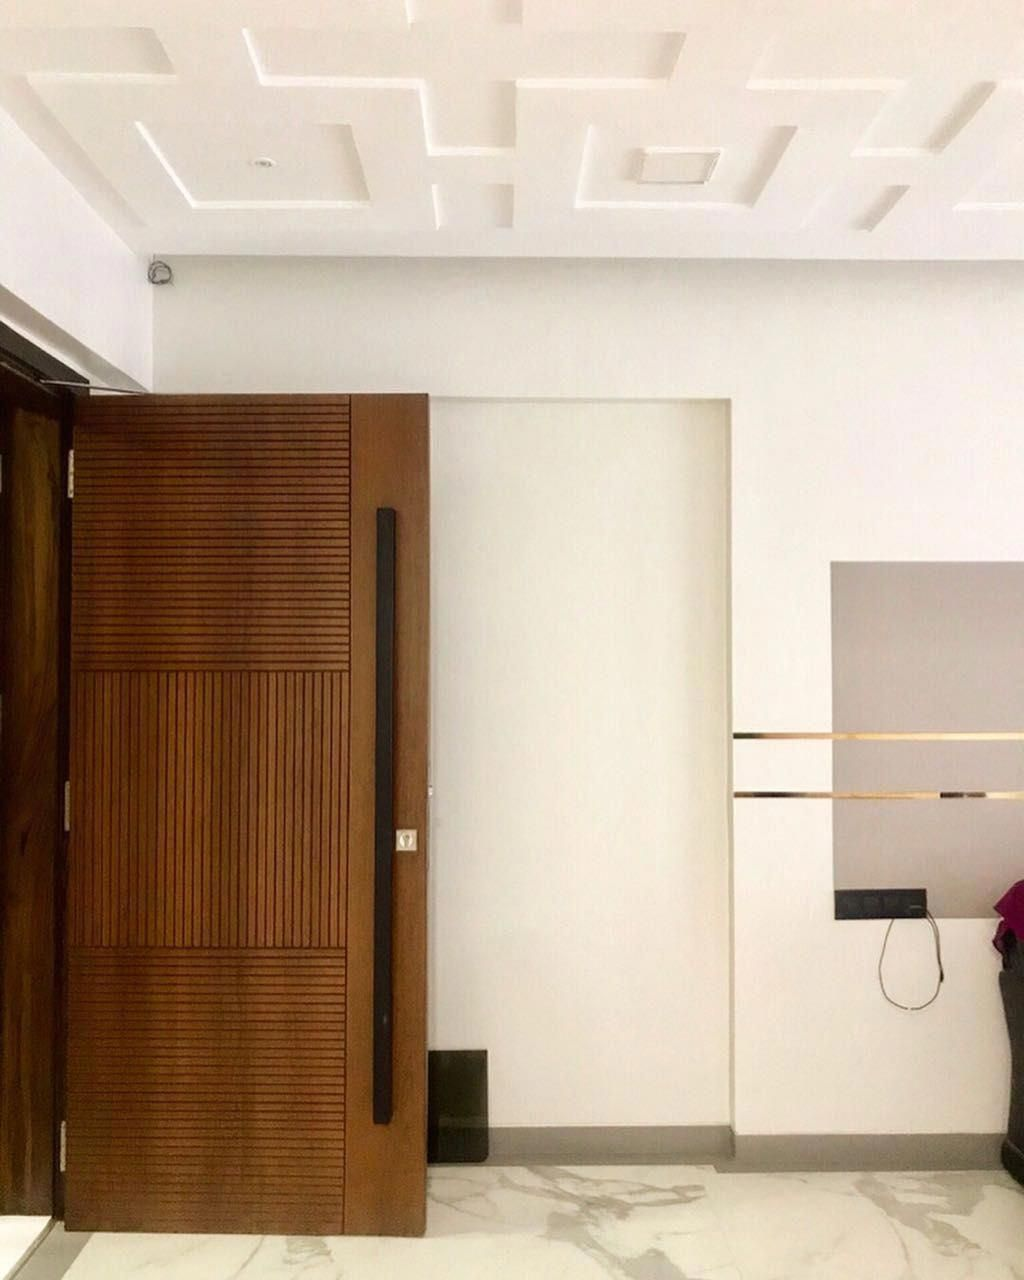 Interior Slab Doors Solid Oak Front Doors With Glass Real Wood Doors 20190527 Puertas Interiores Diseno Puertas Puertas Principales De Madera